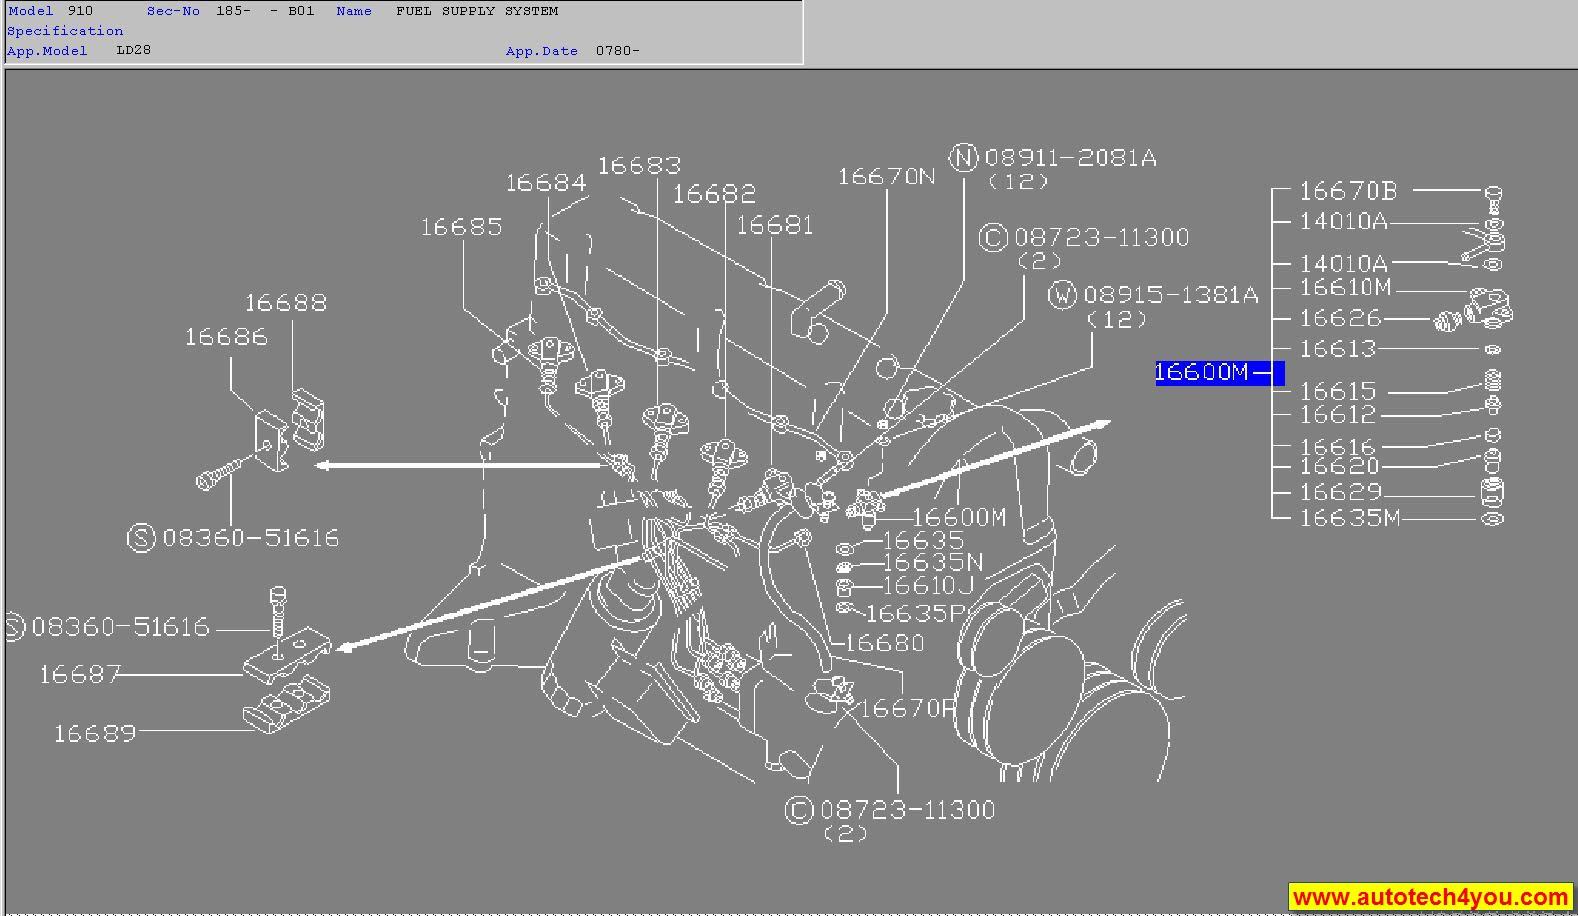 Nissan Ud 2000 Wiring Diagram. Nissan. Auto Wiring Diagram